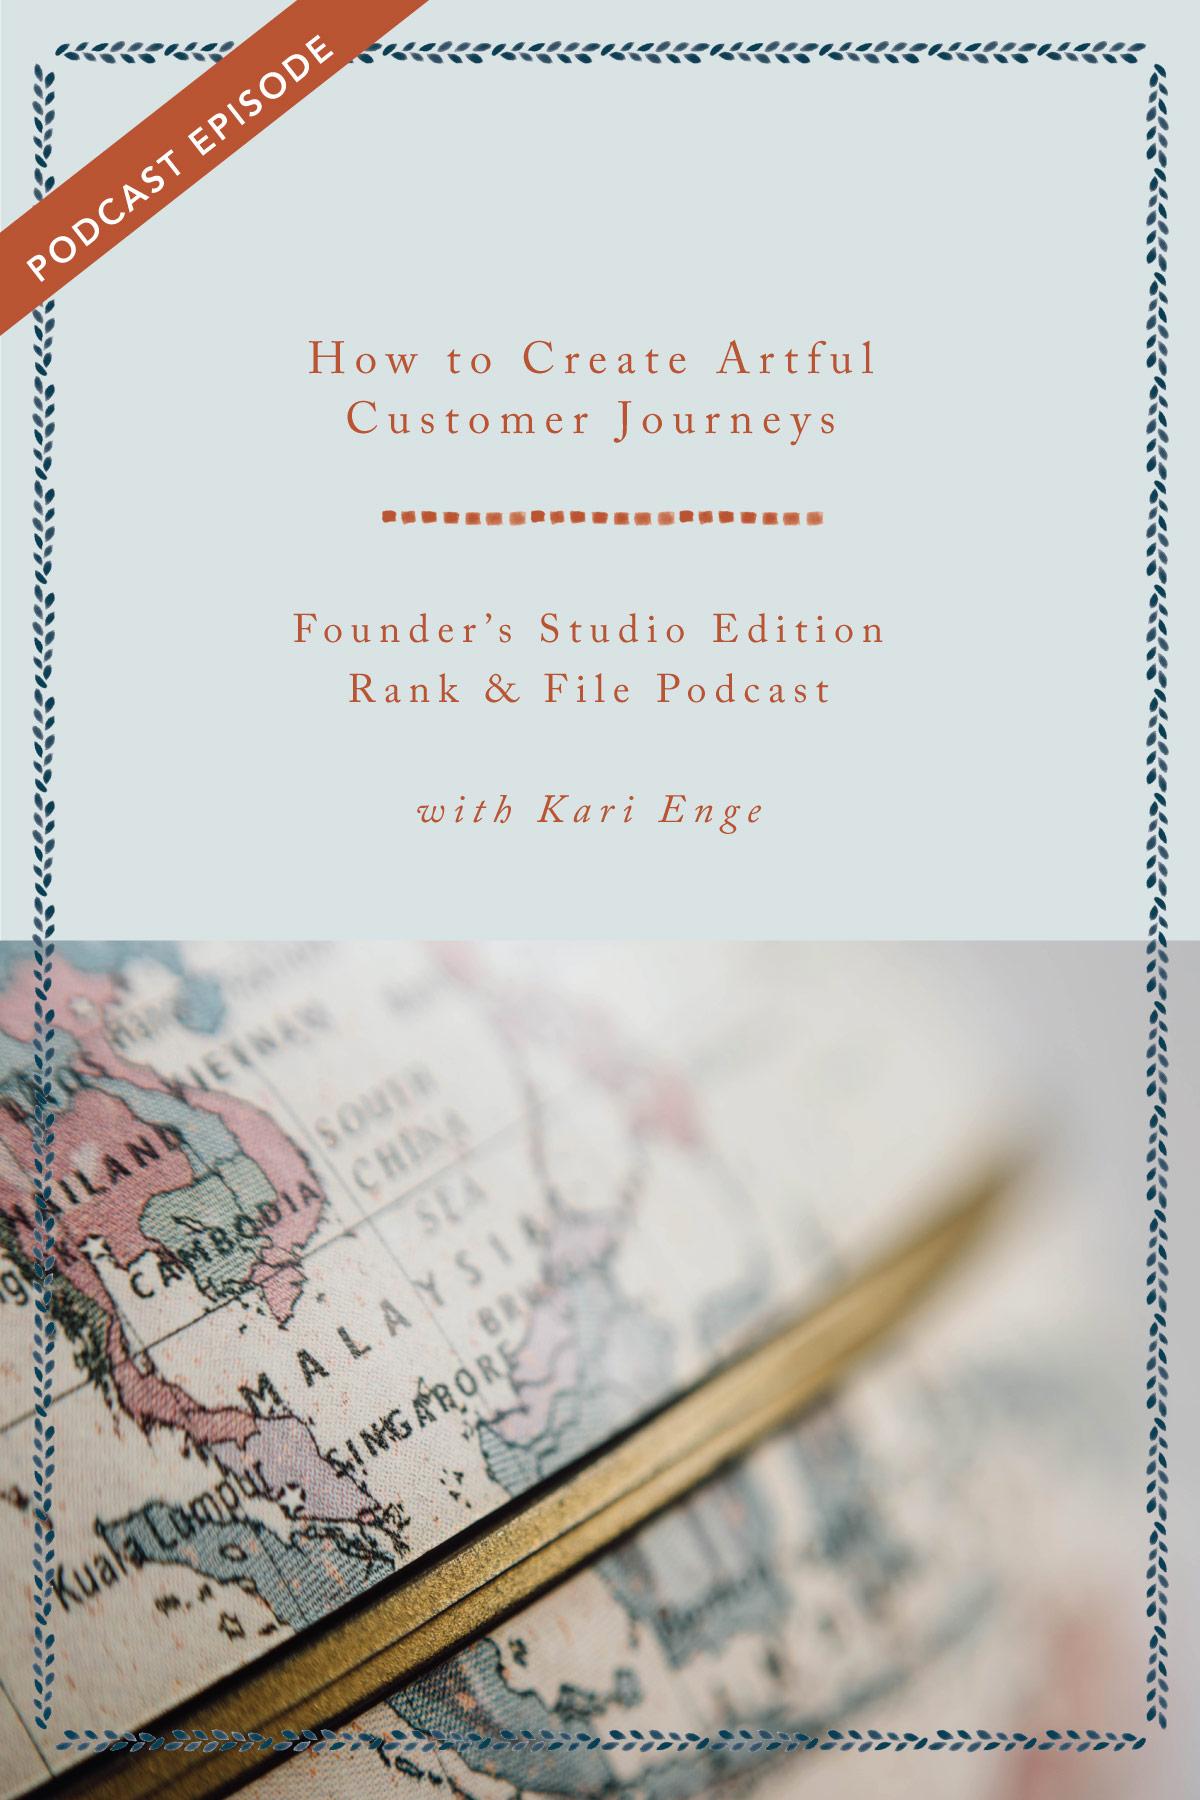 How to Create Artful Customer Journeys   Episode #32 - Rank & File